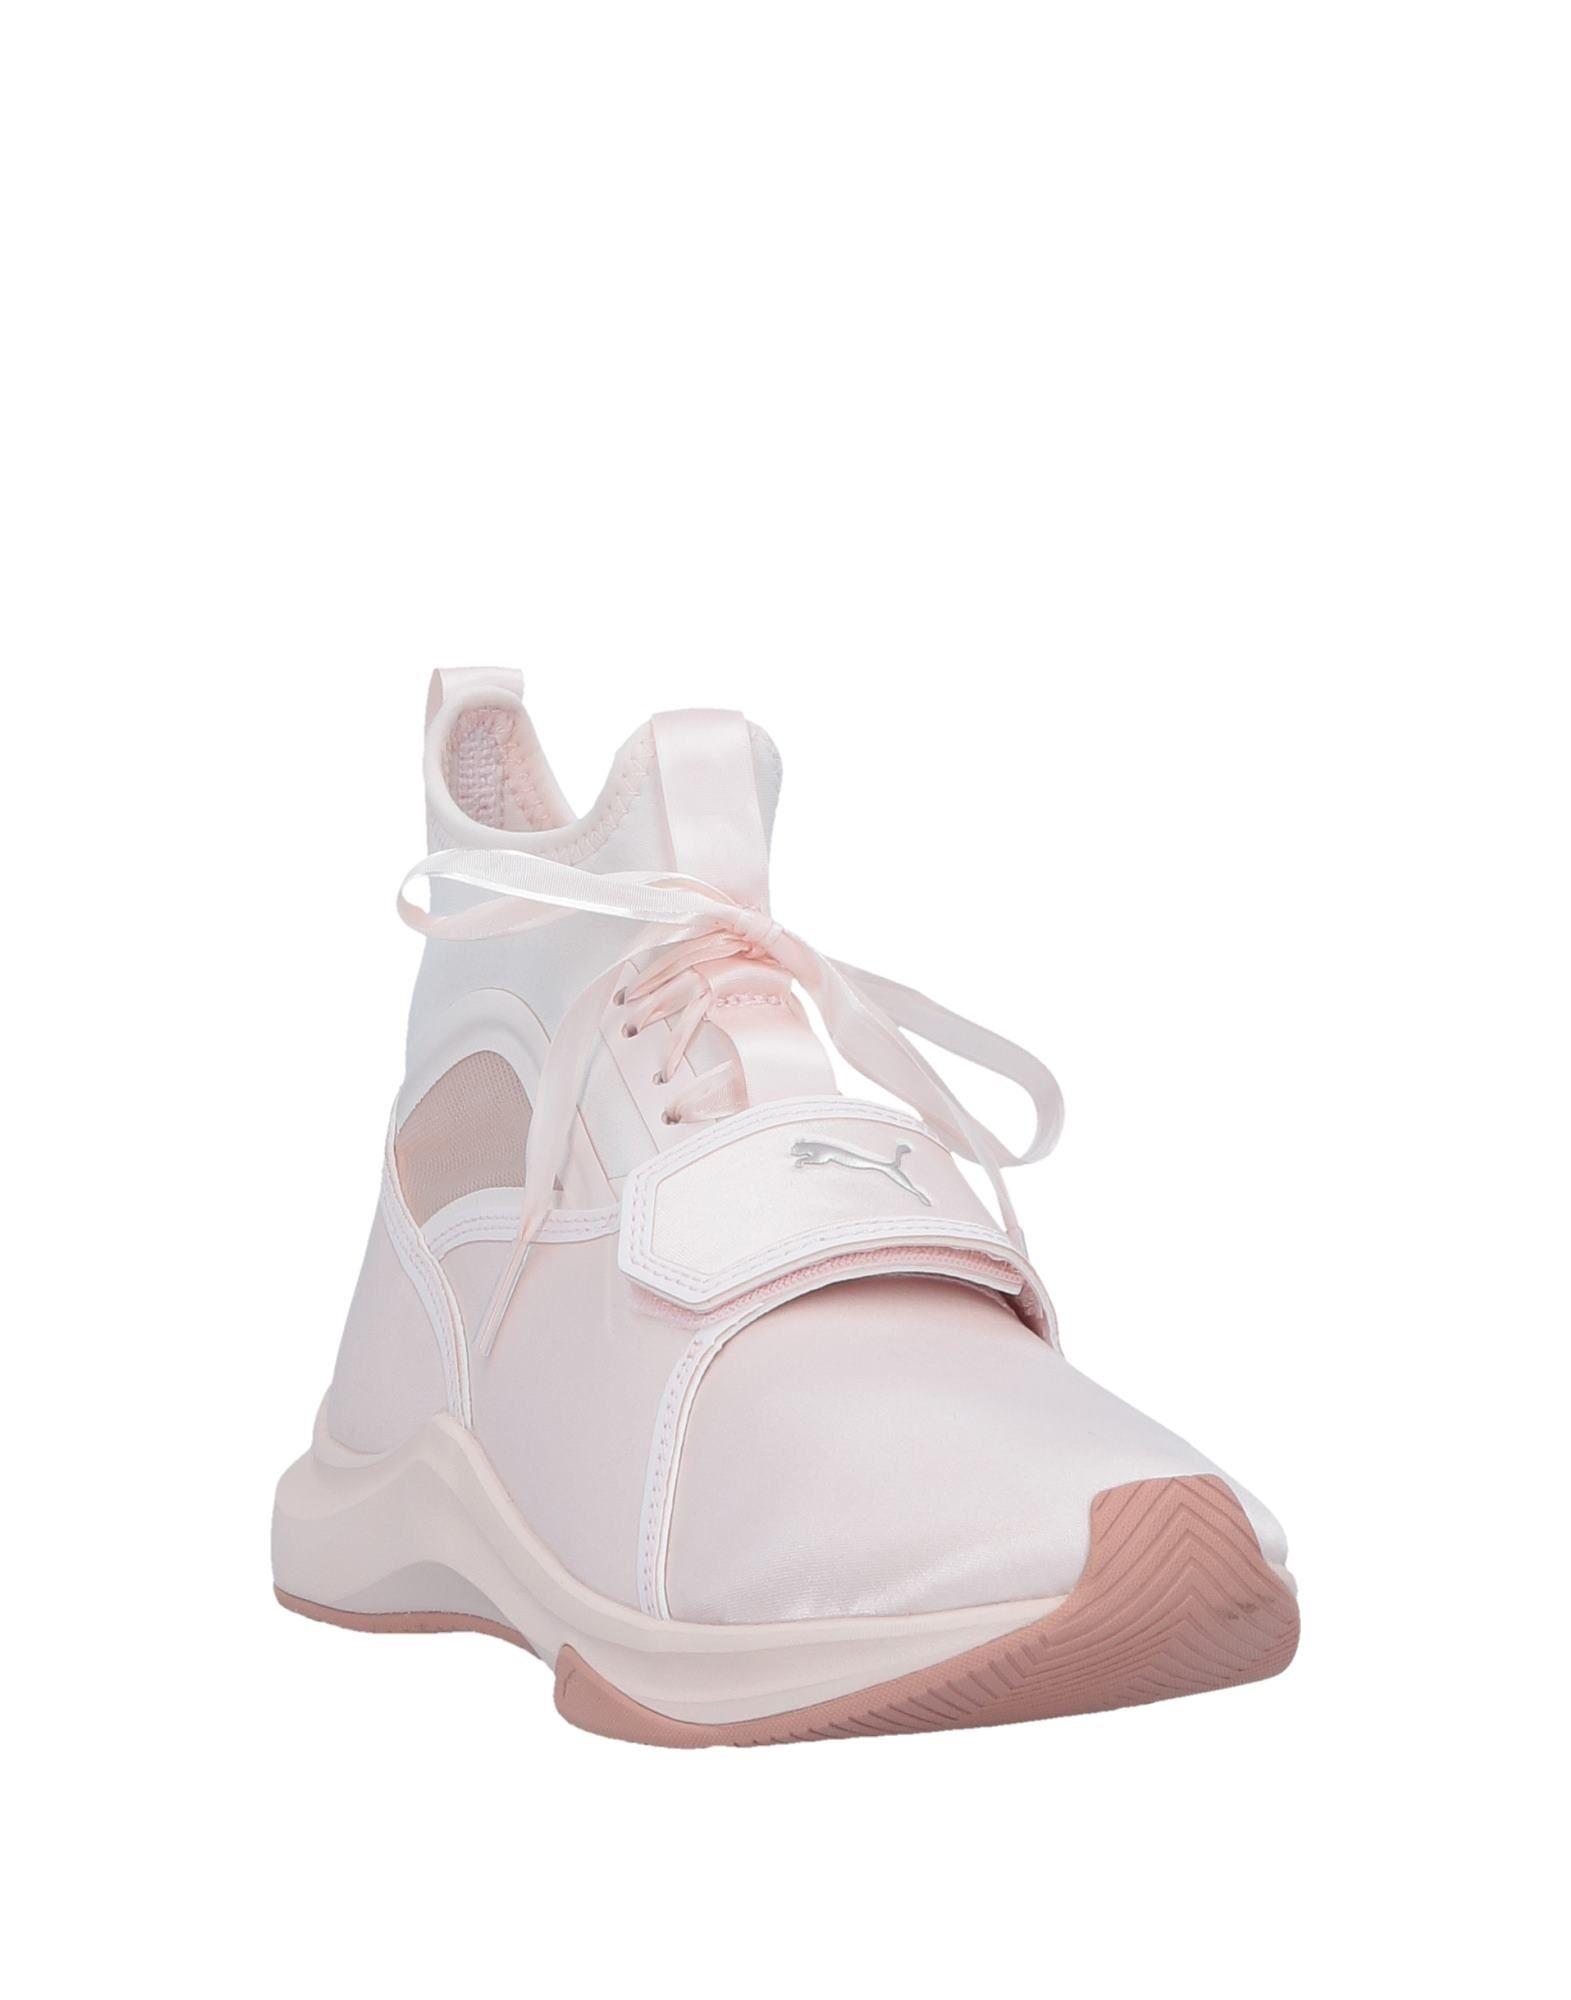 Puma Gute Sneakers Damen  11529039CL Gute Puma Qualität beliebte Schuhe 5e26ed